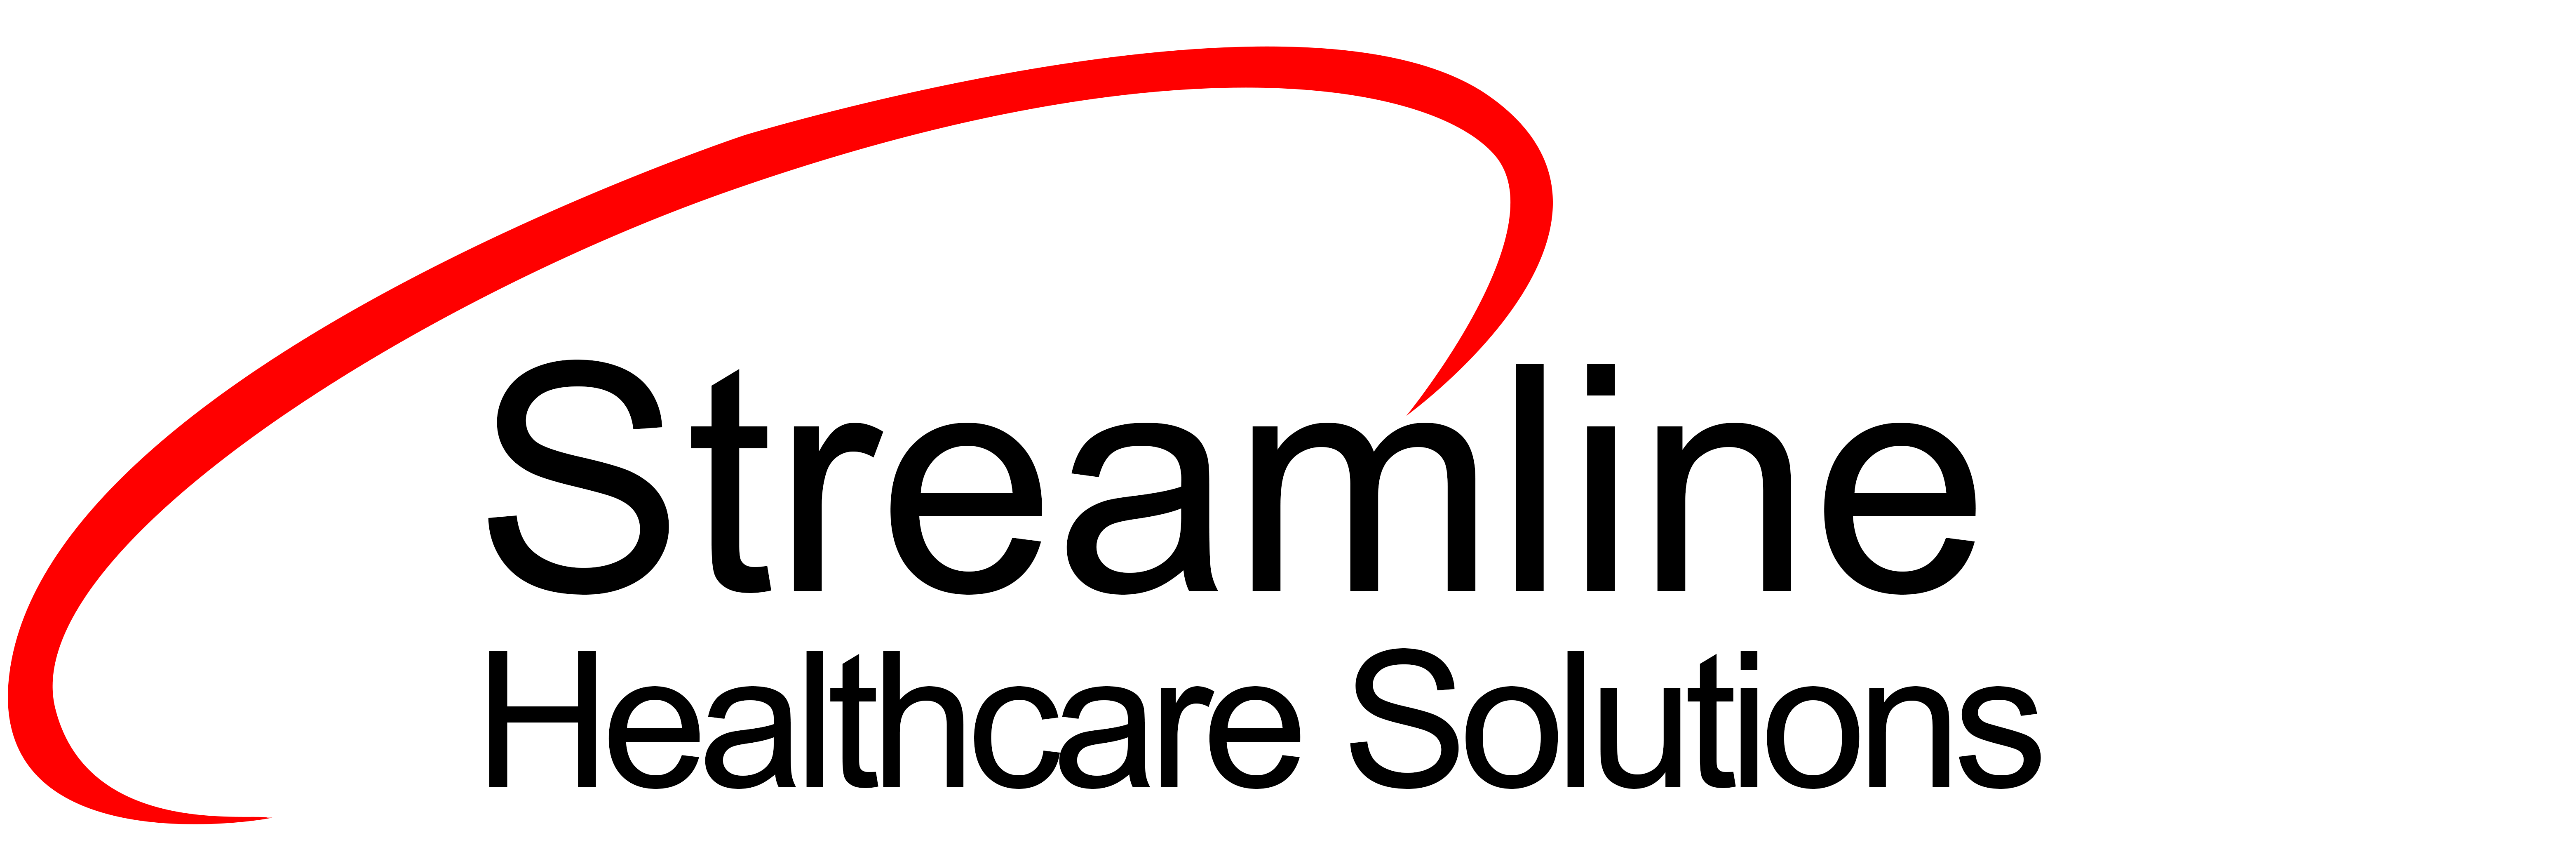 Logo of Streamline Healthcare Solutions